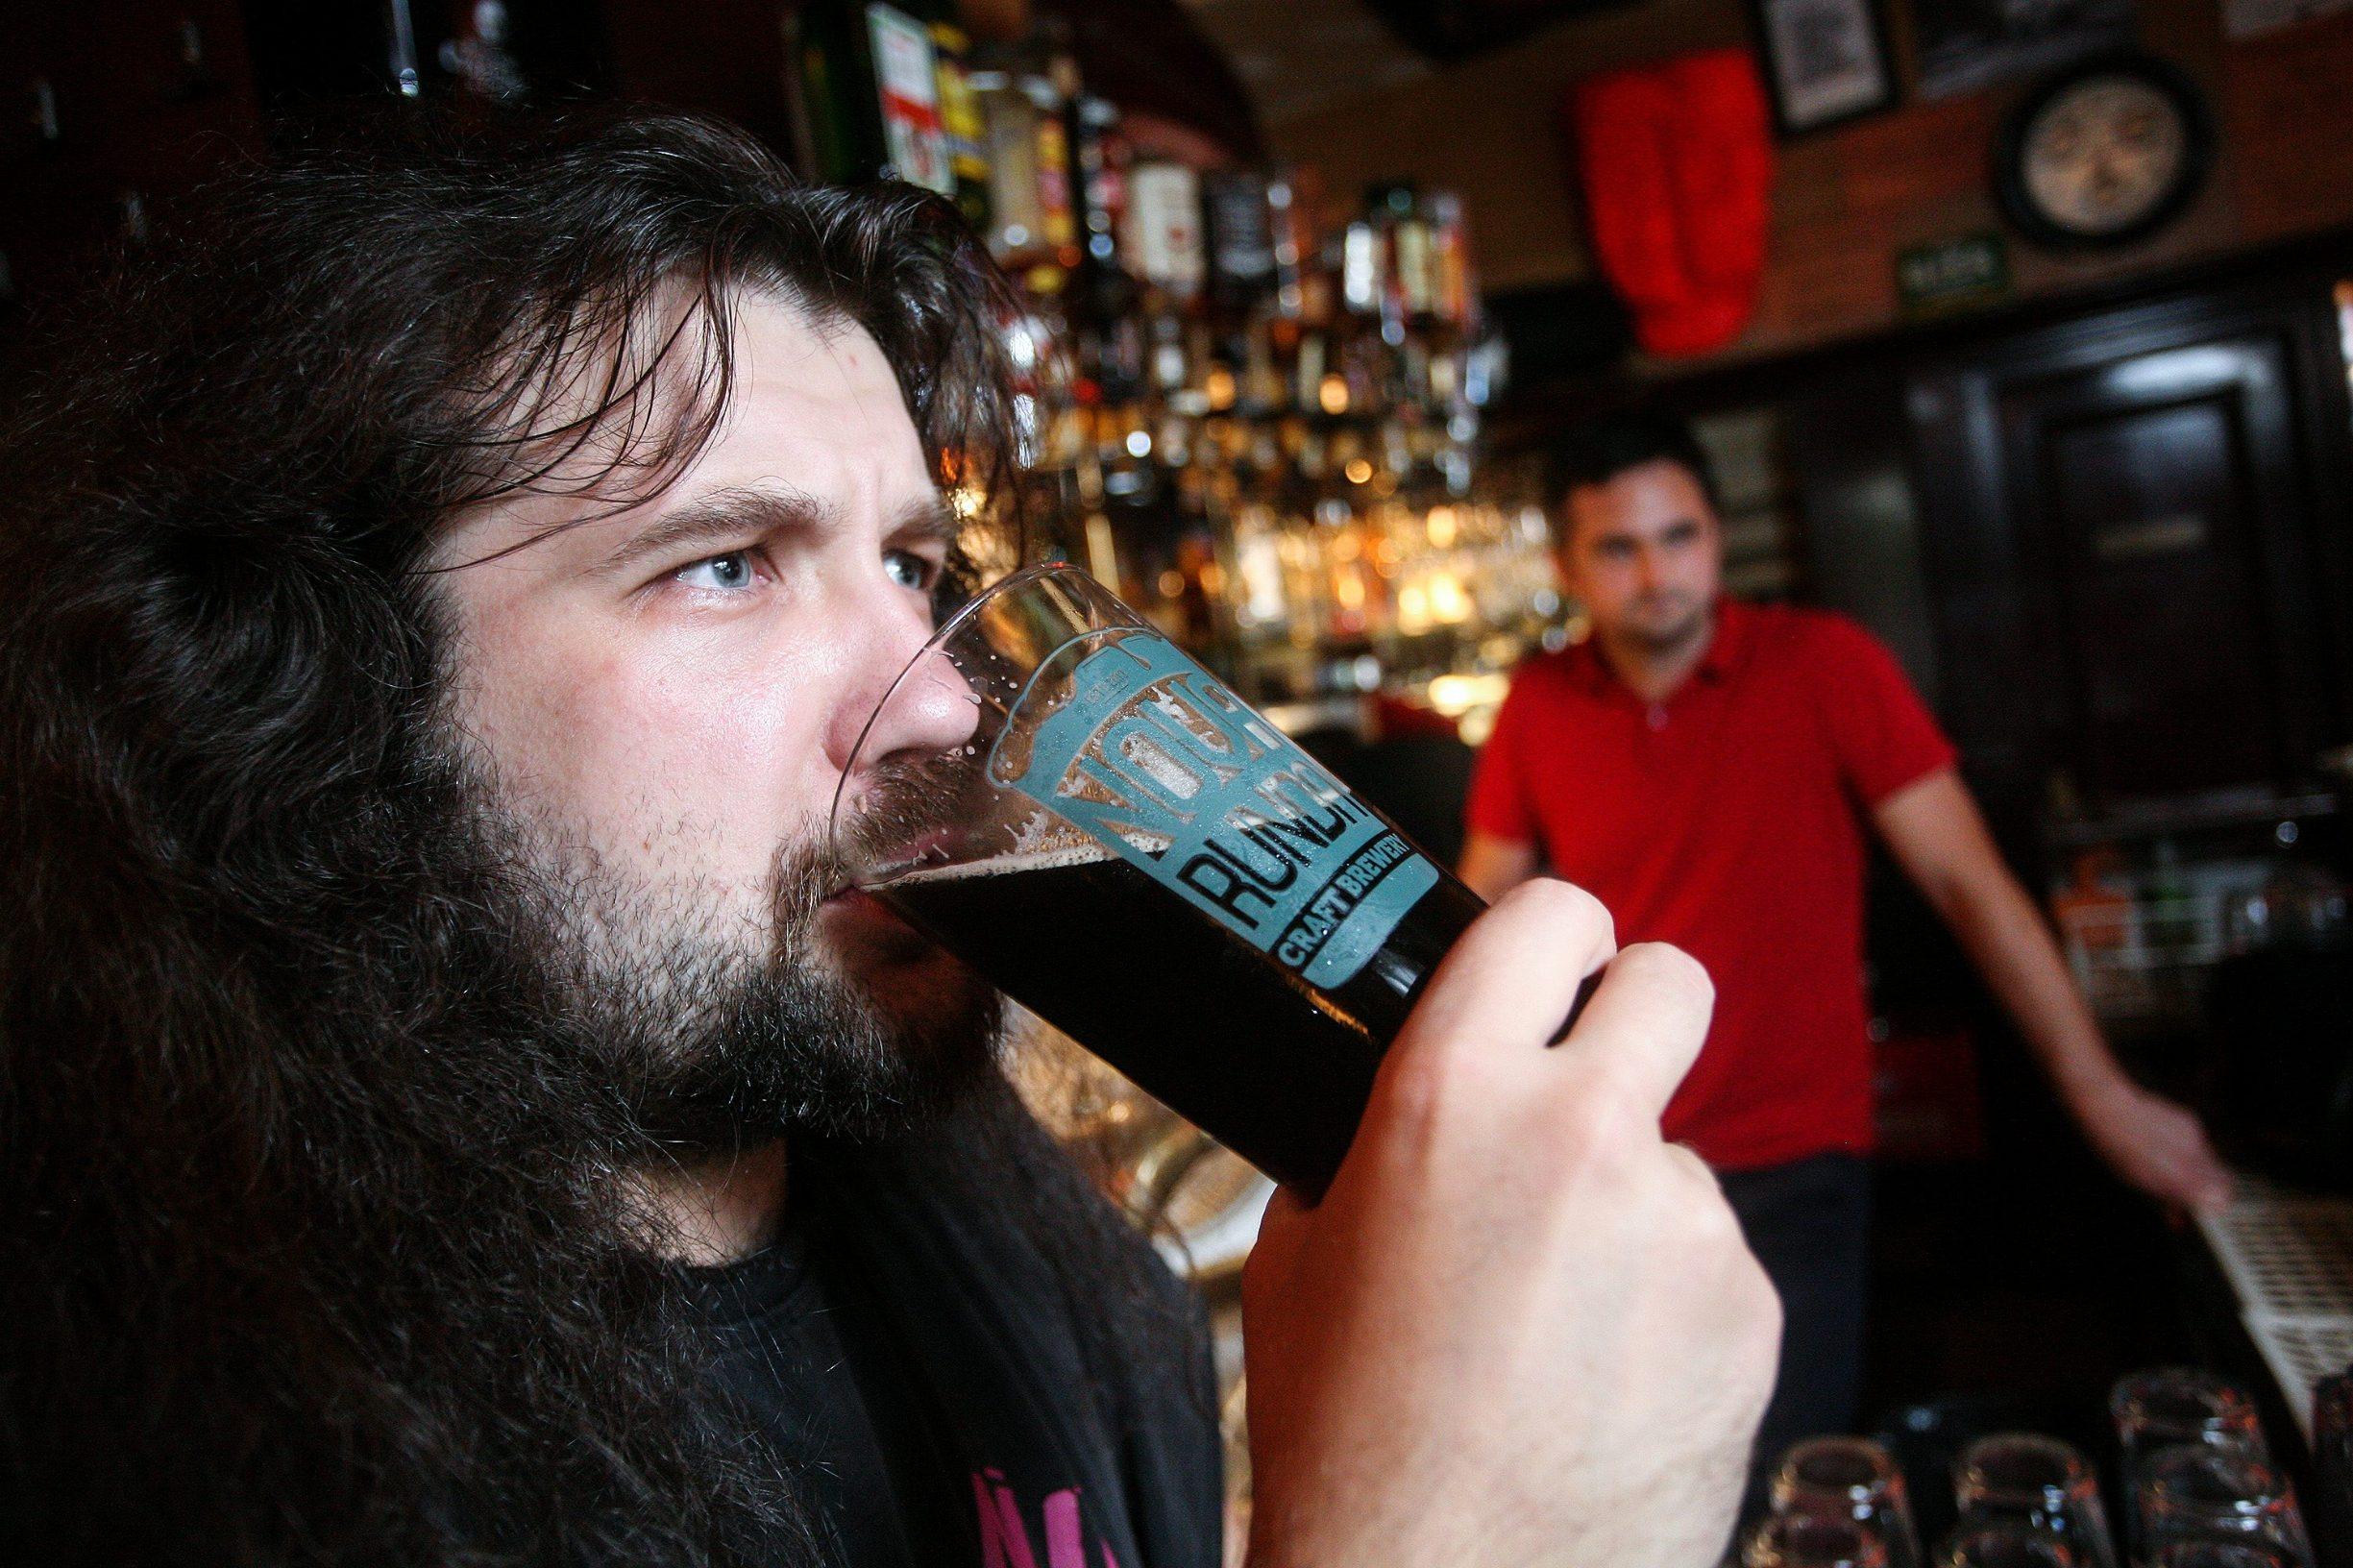 Zagreb, 200814. Opatovina 29. Reportaza o dvojici  vlasnika male pivovare Nova runda. Foto: Goran Mehkek / CROPIX